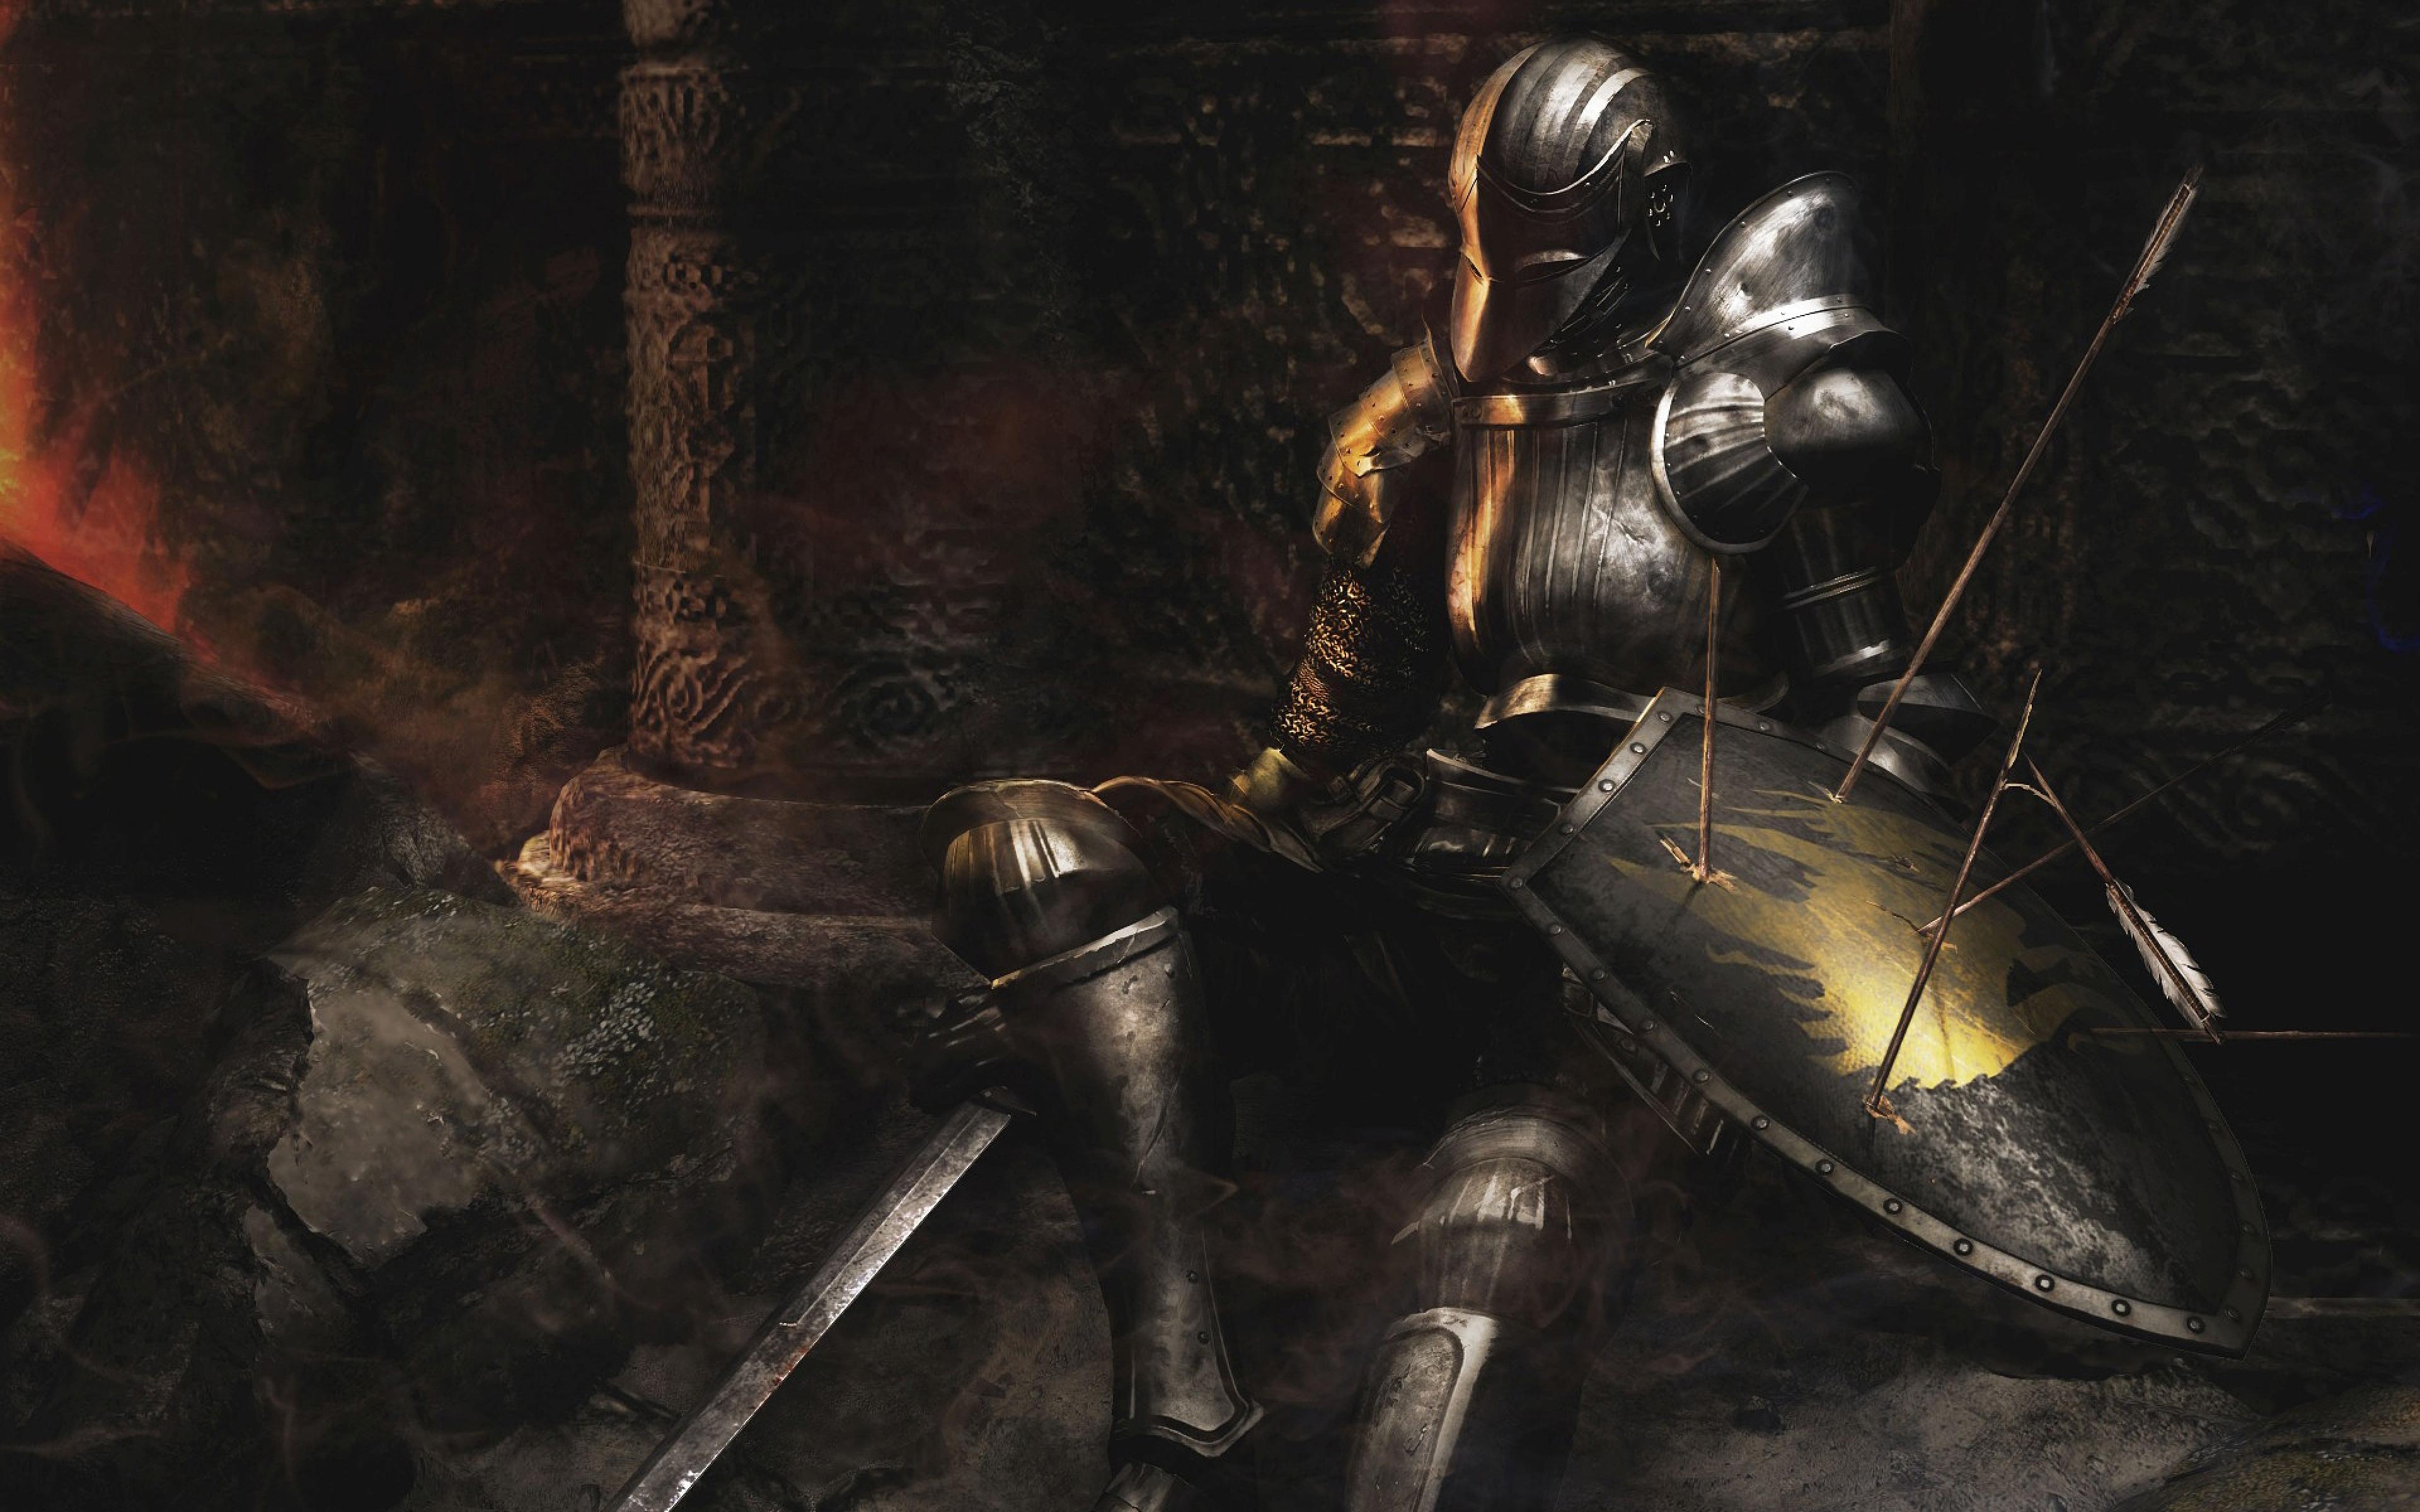 Download Wallpaper 3840x2400 dark souls armor shiled arrows sword 3840x2400